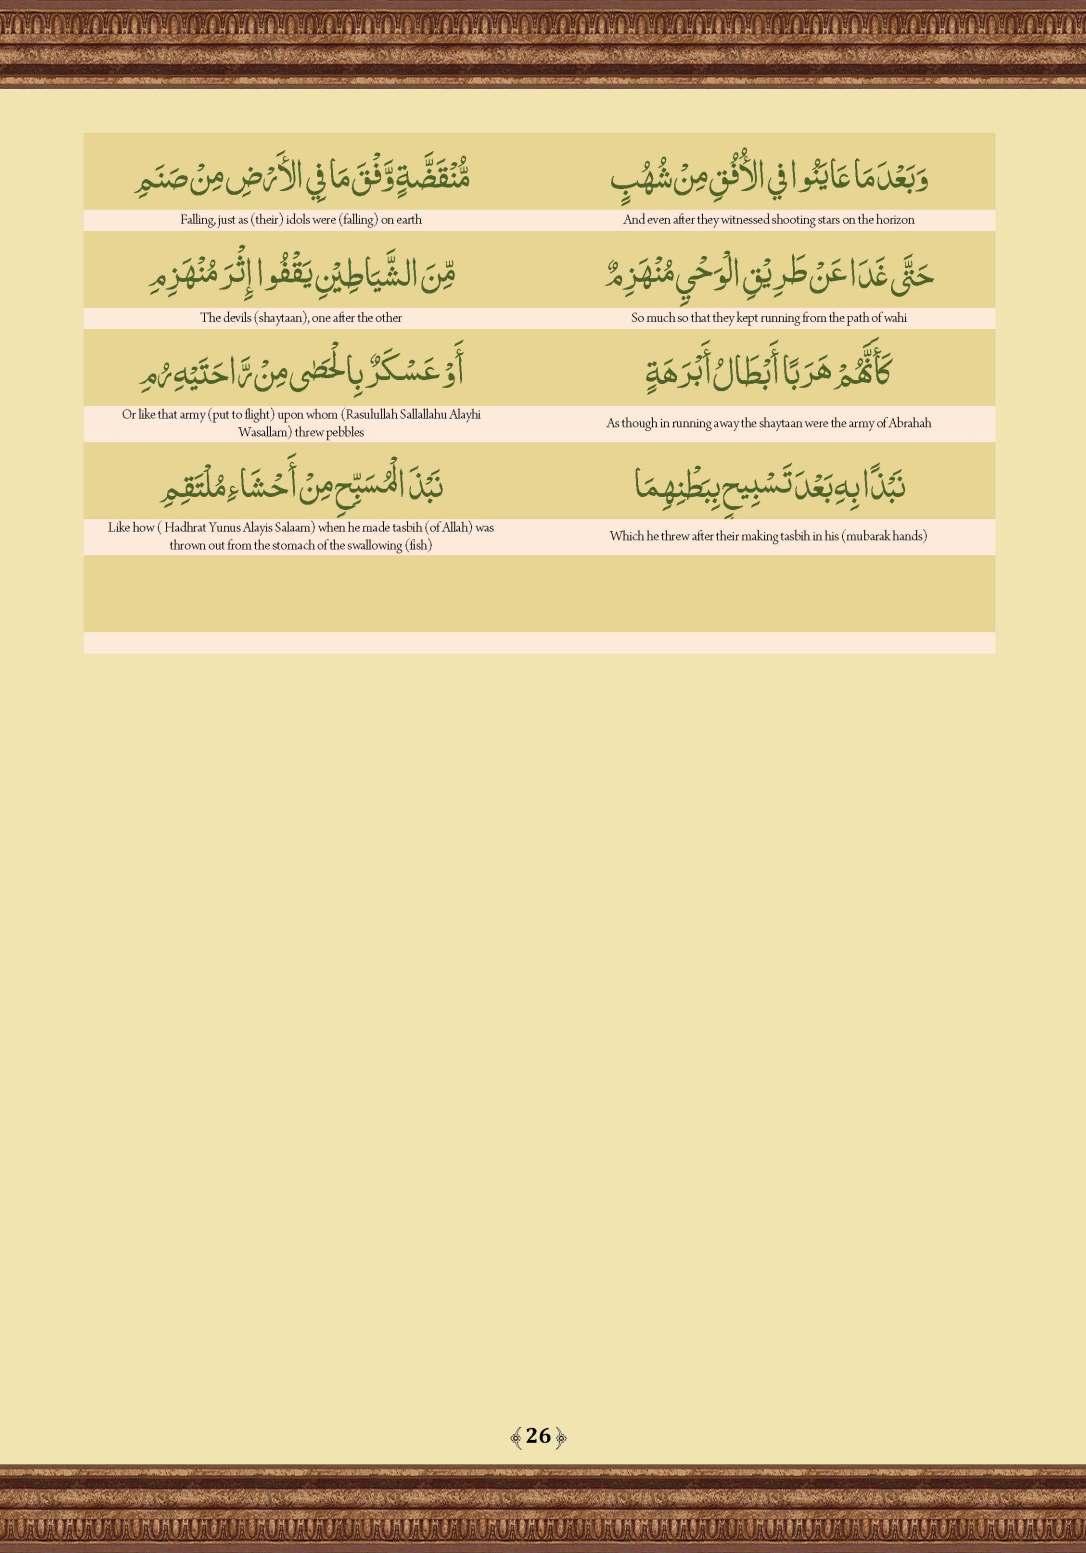 Qasidat_al-Burda_Page_26